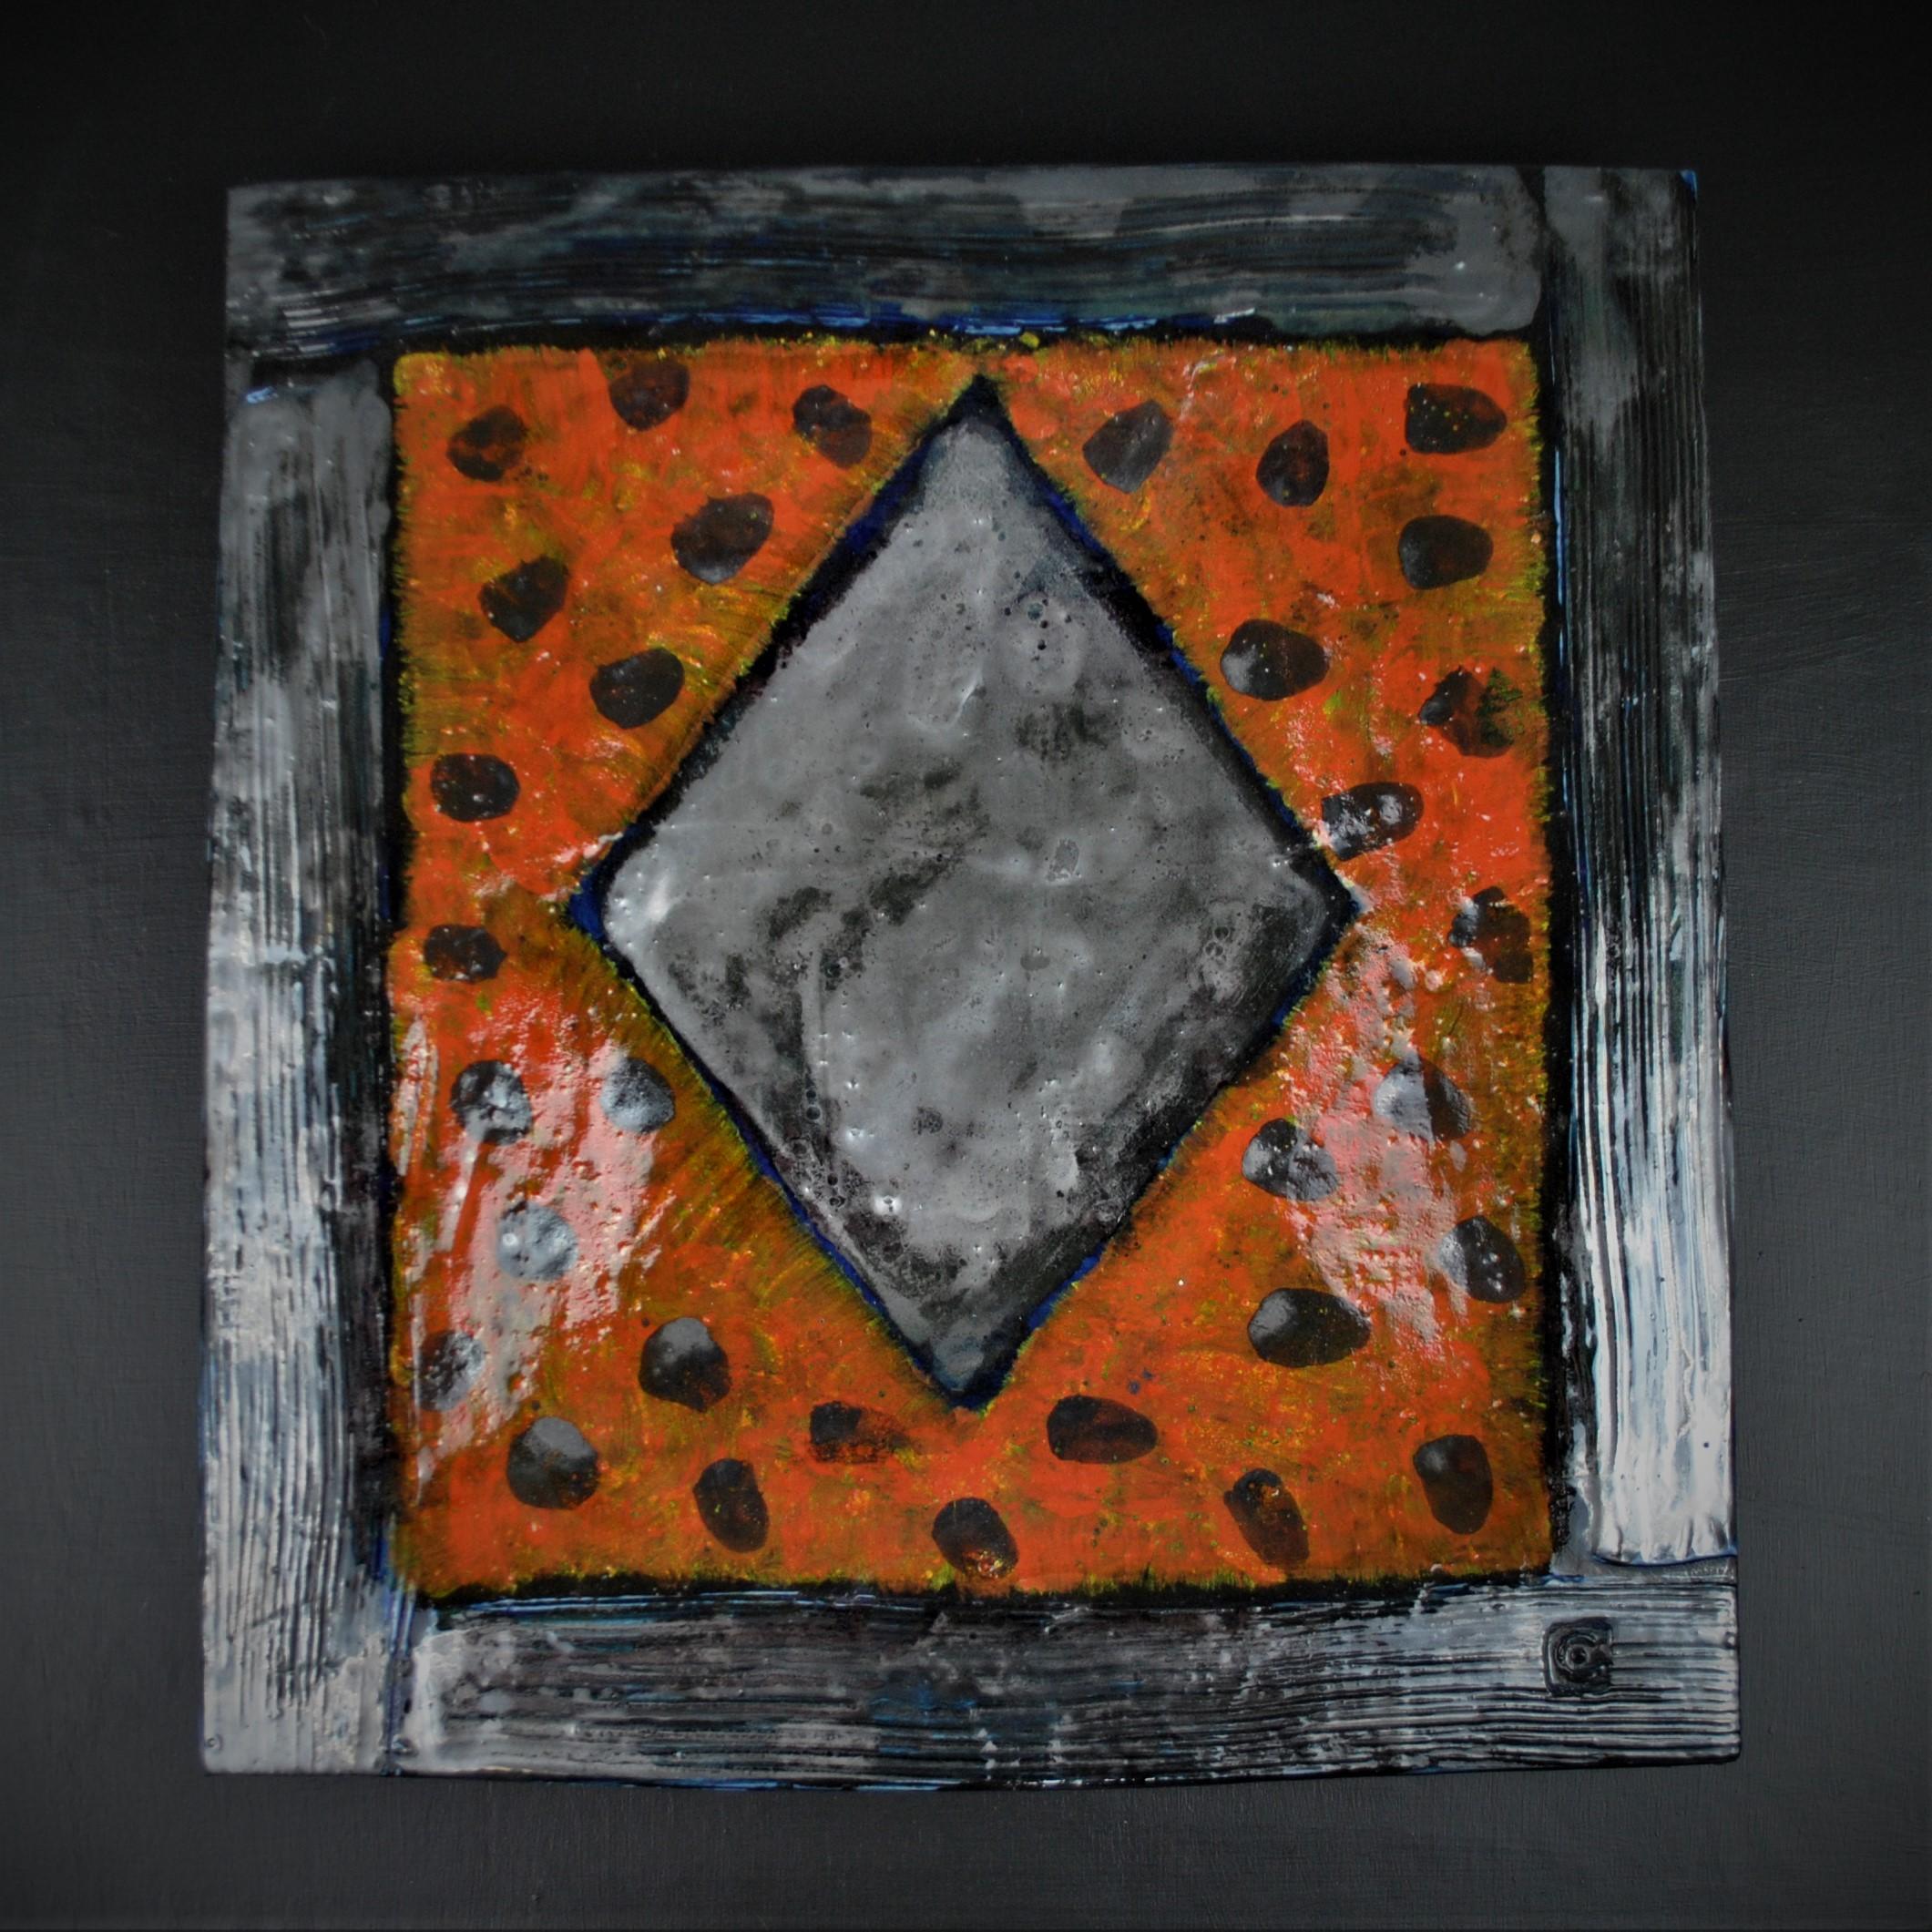 Mike Cain 2019 Diamond motif. Orange square with dots on black background.  (Square edit) DSC_6257 (2).JPG